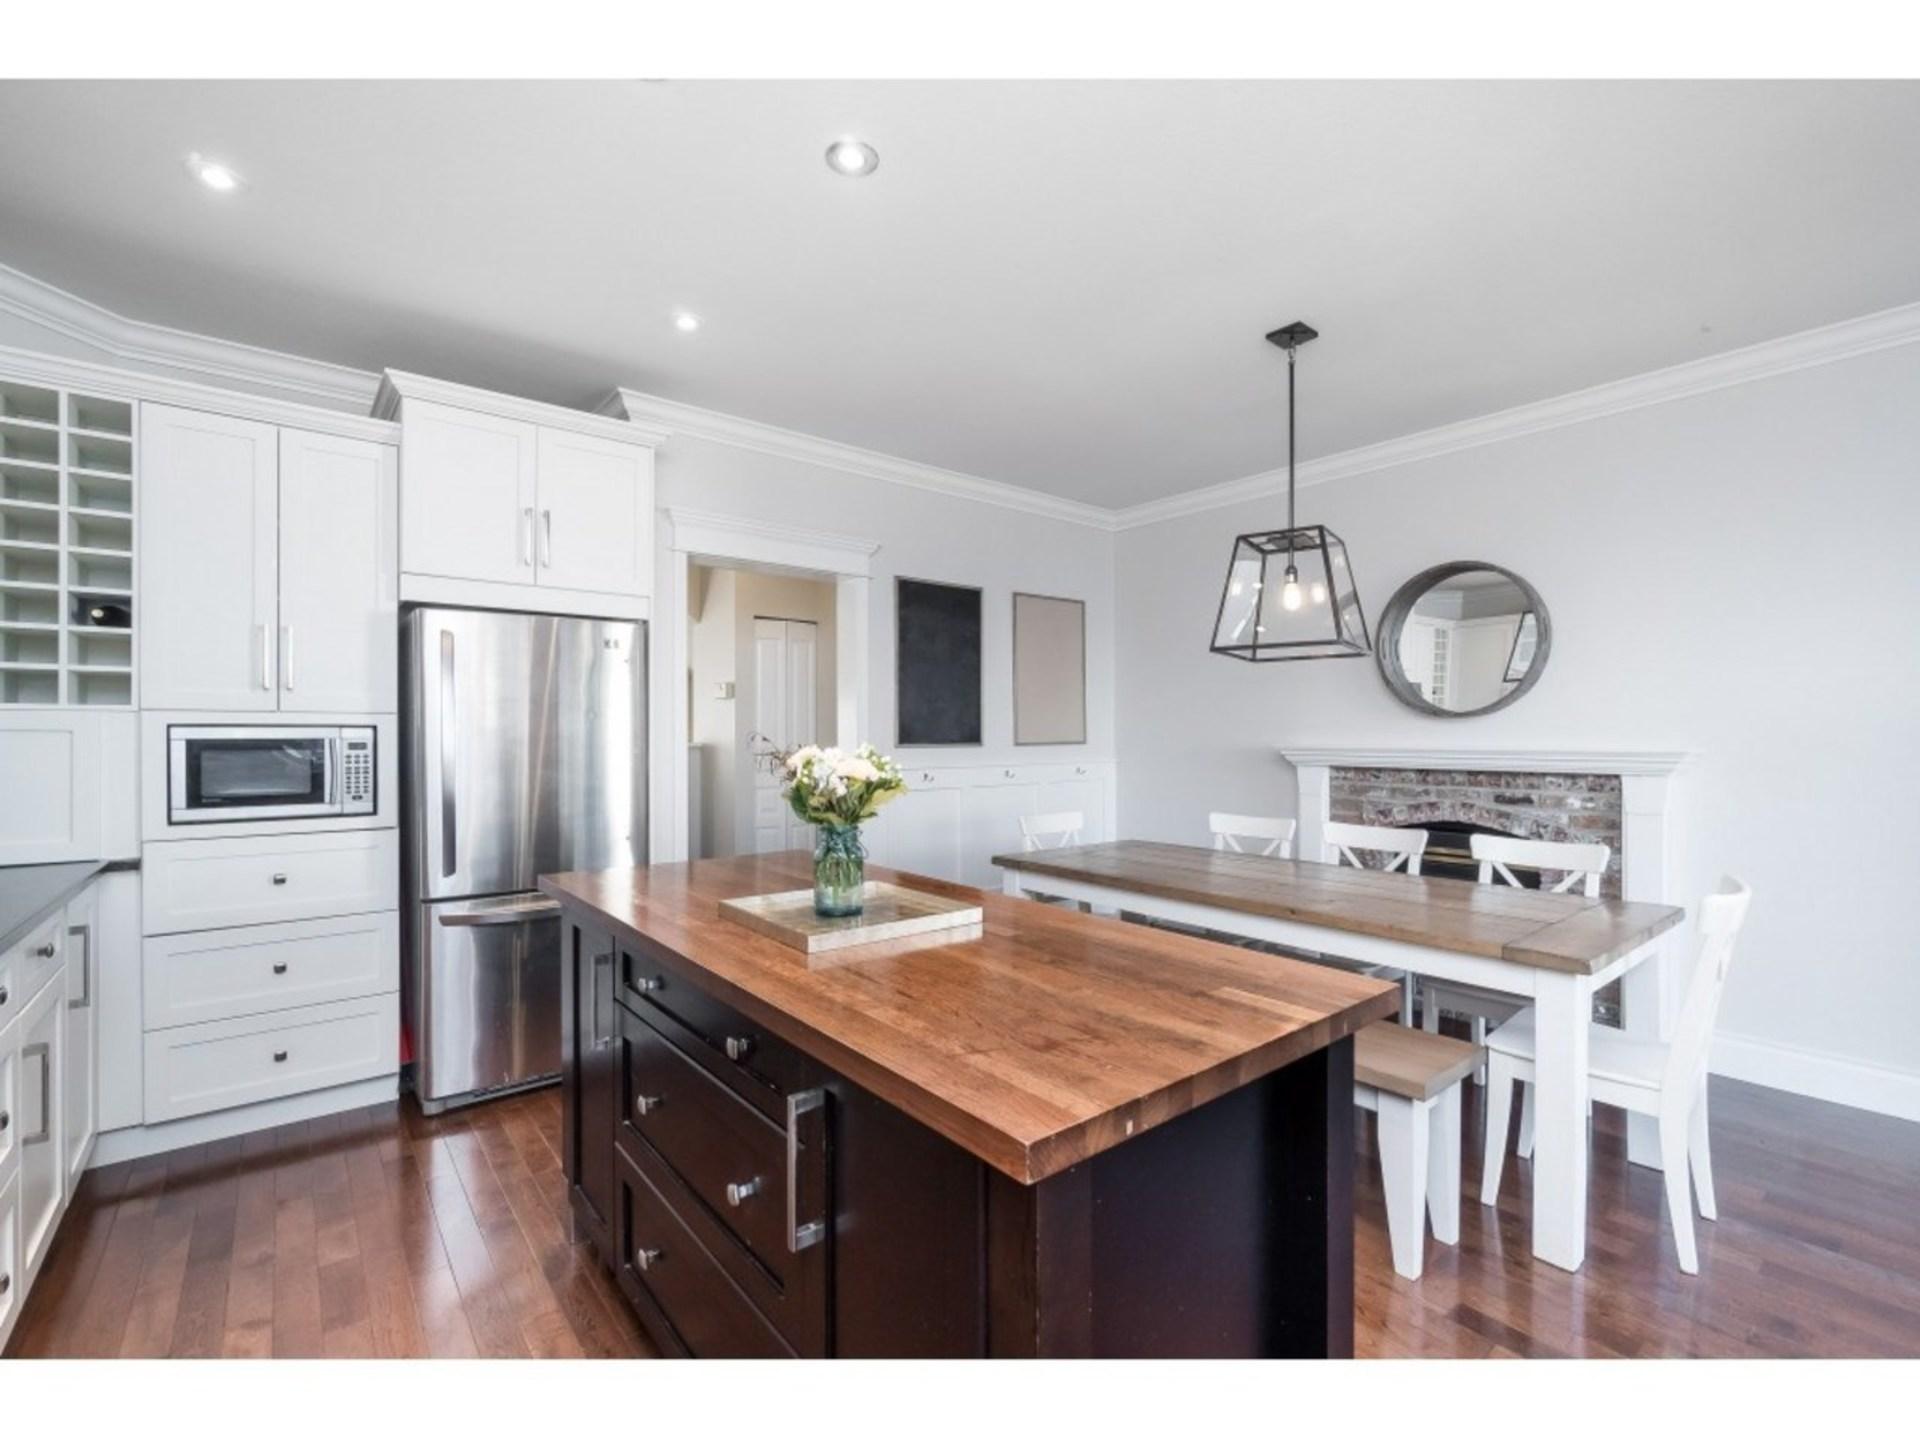 18457-65-avenue-cloverdale-bc-cloverdale-06 at 18457 65 Avenue, Cloverdale BC, Cloverdale